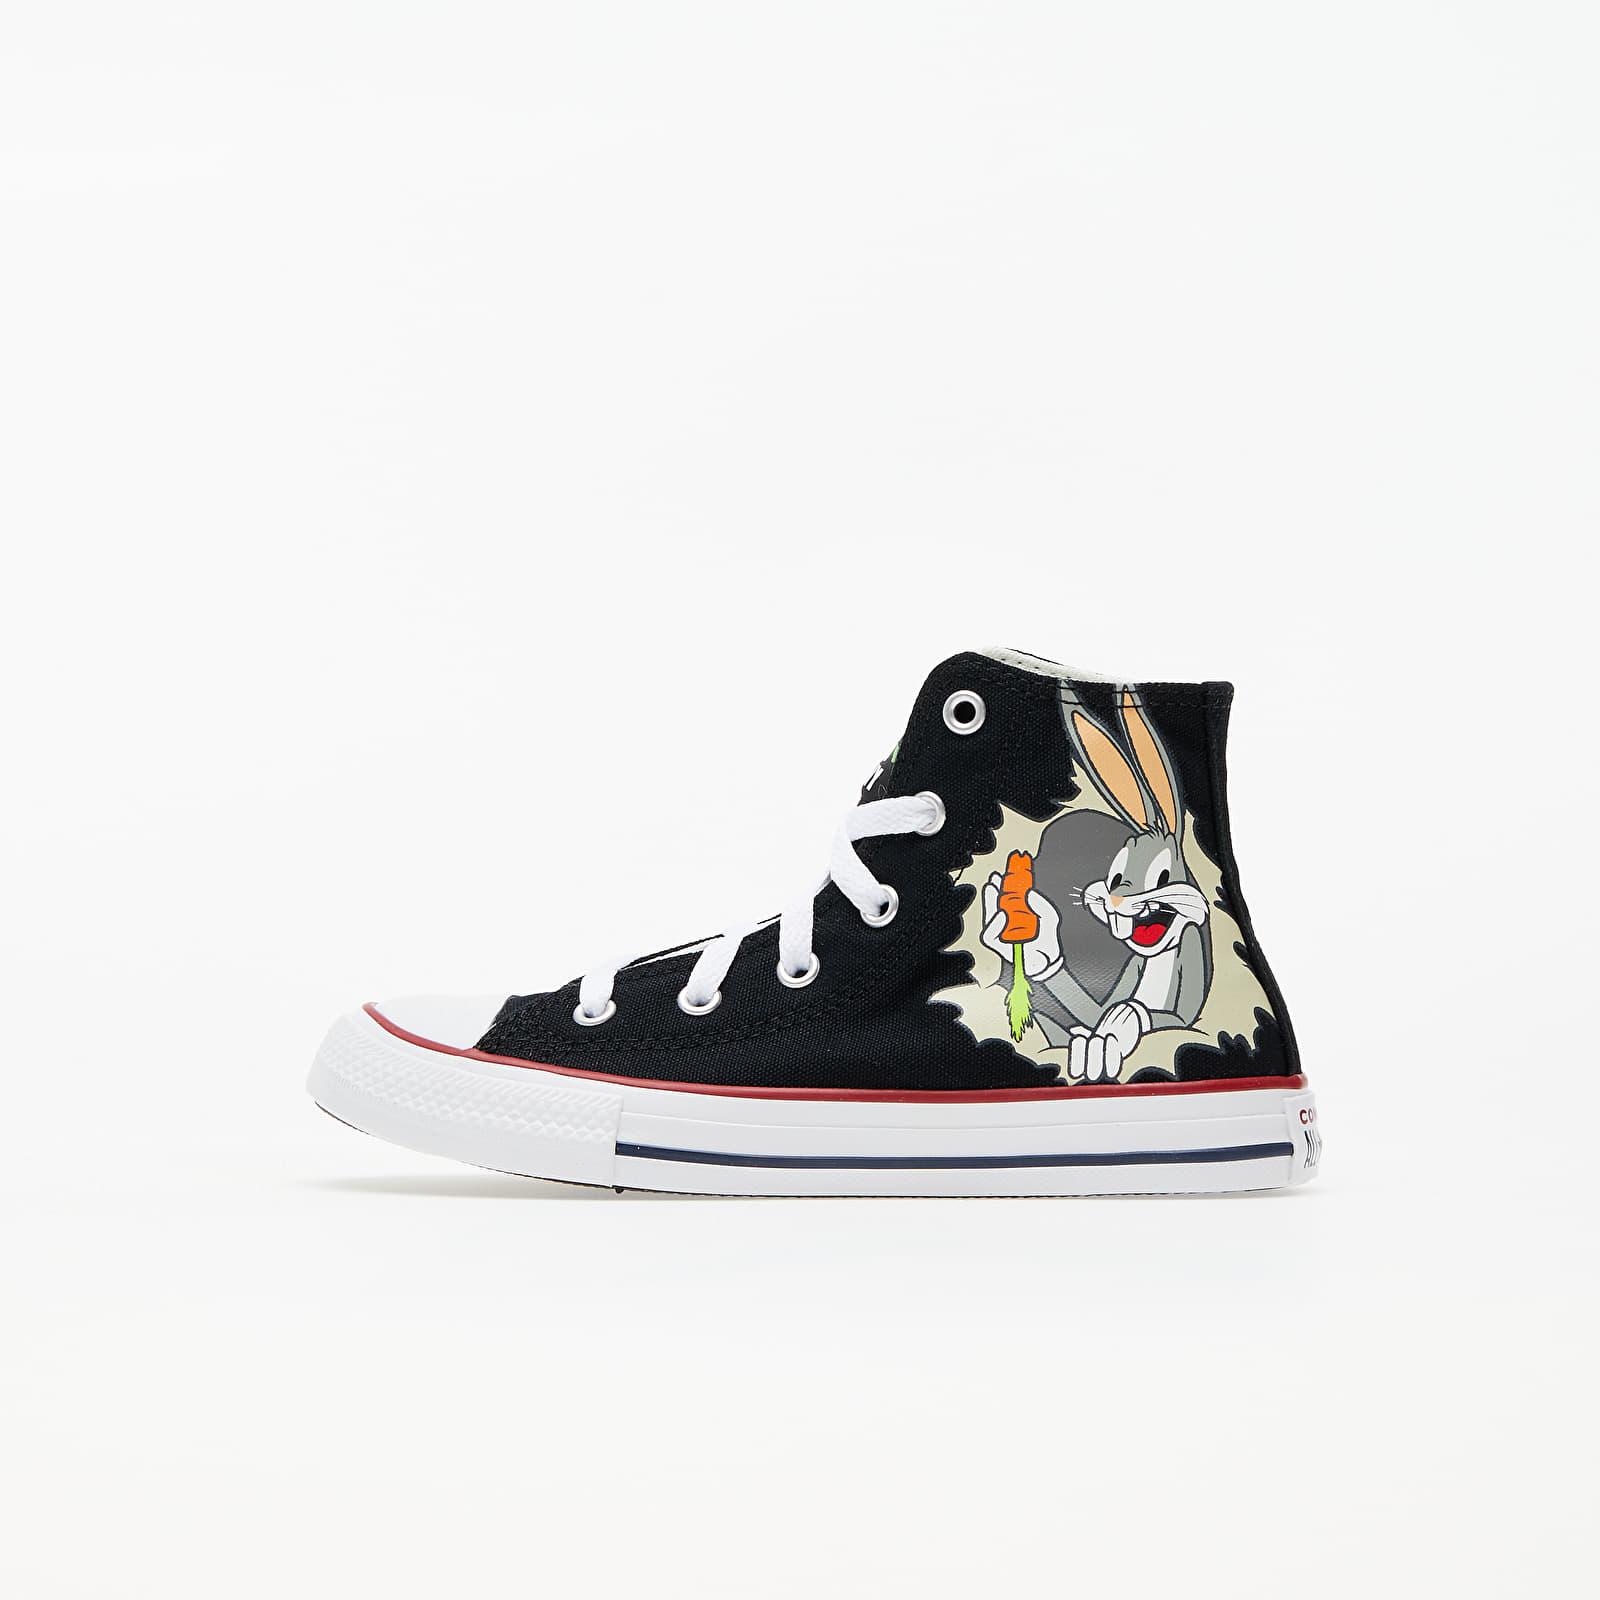 Converse x Bugs Bunny Chuck Taylor All Star Hi Black/ Multi EUR 31.5